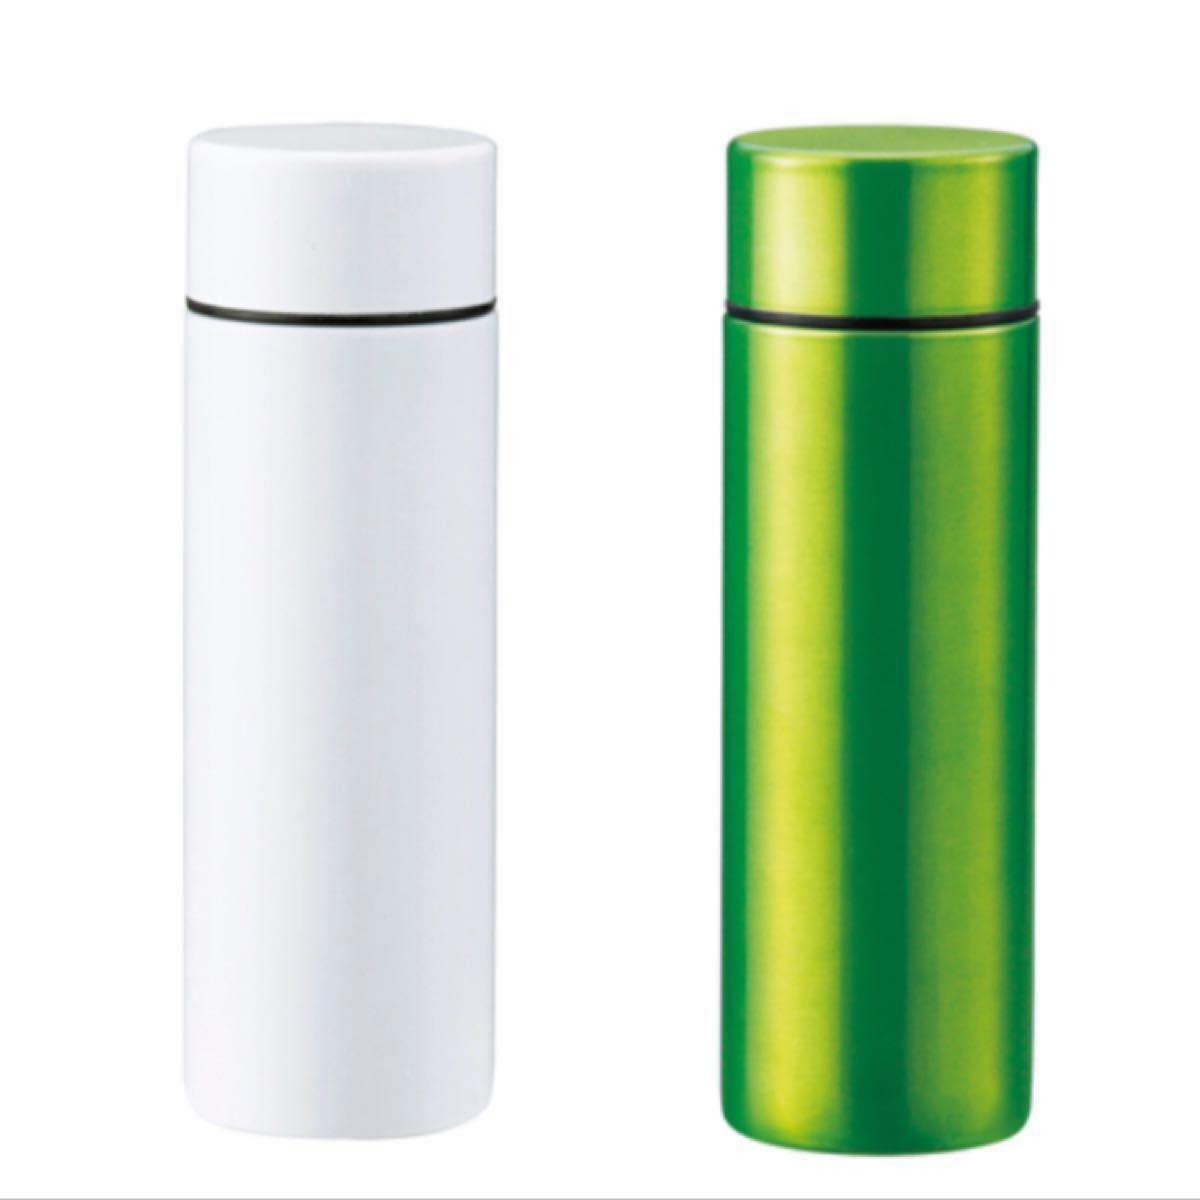 140ml サーモボトル ポケットサイズ 真空 二重構造 ステンレスボトル 5本